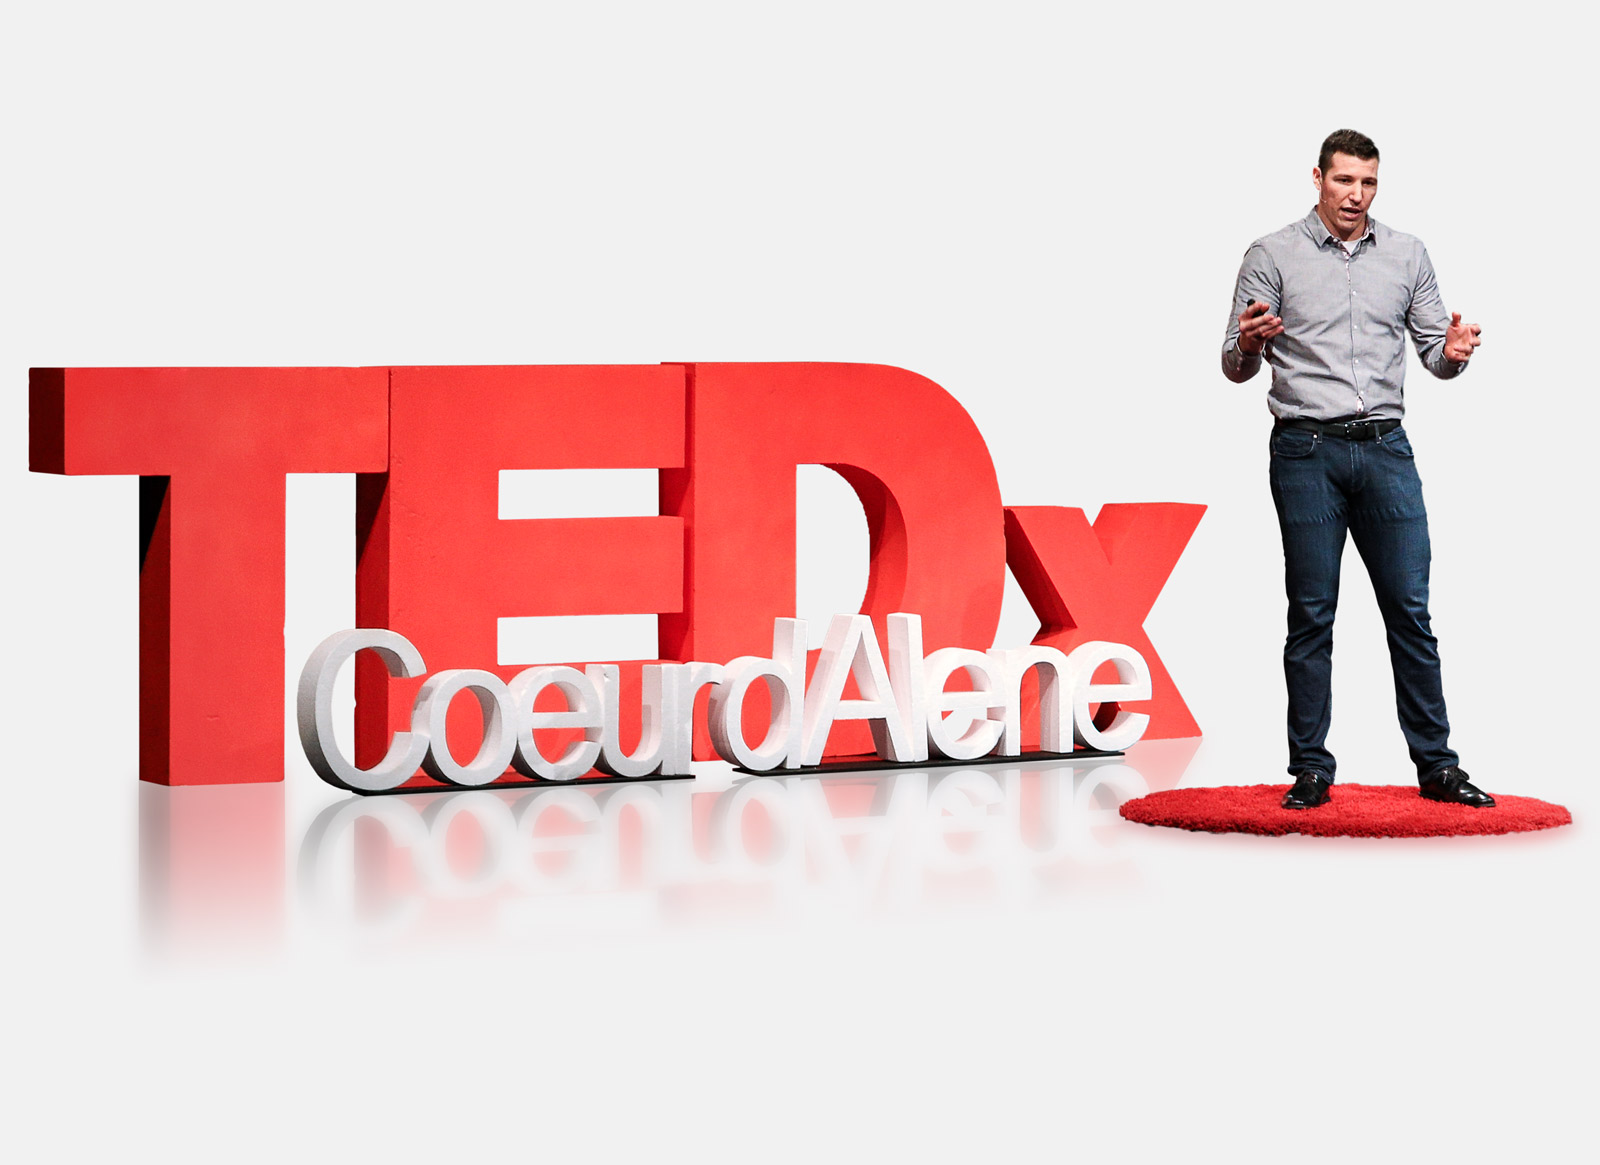 Image of our CEO, Tyler Alvarado talking at TEDx Coeur d'Alene.